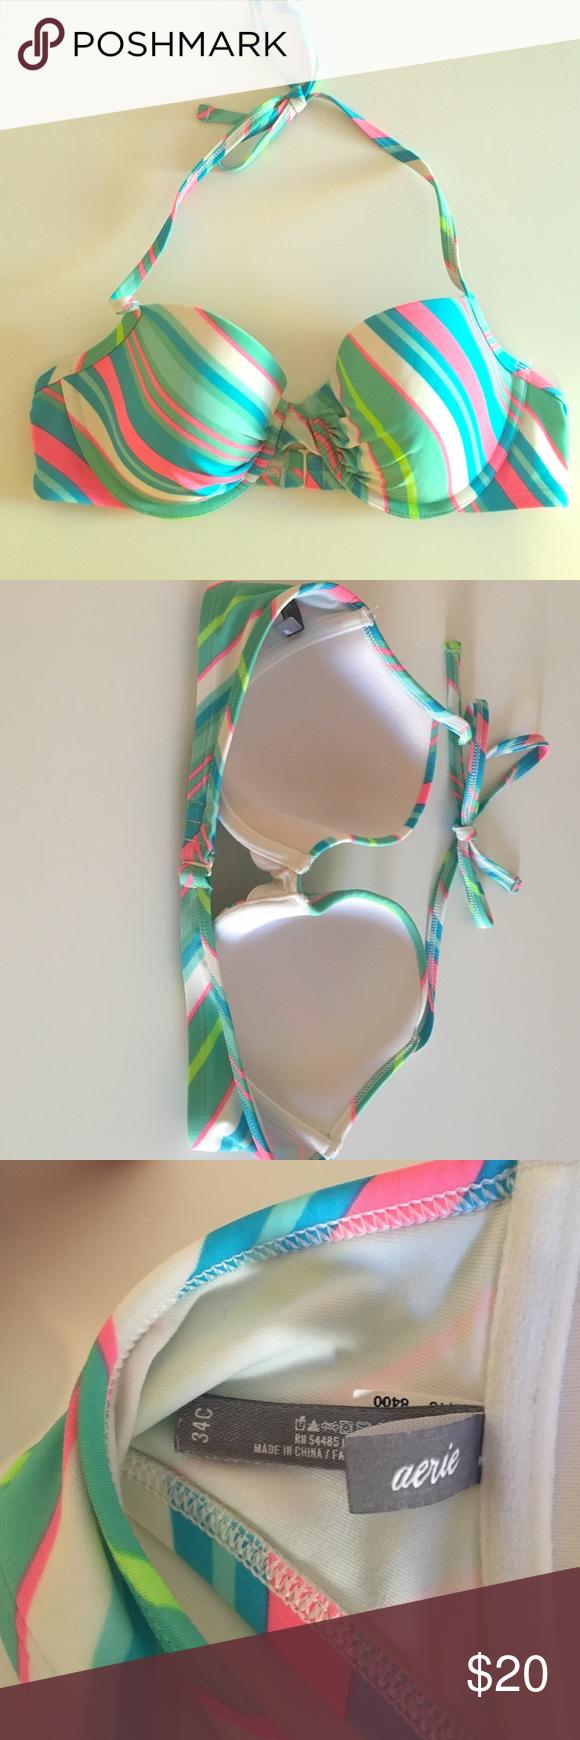 Aerie Bikini Top Swim Suit Aerie Blakely Striped Underwire Bikini Top aerie Swim Bikinis